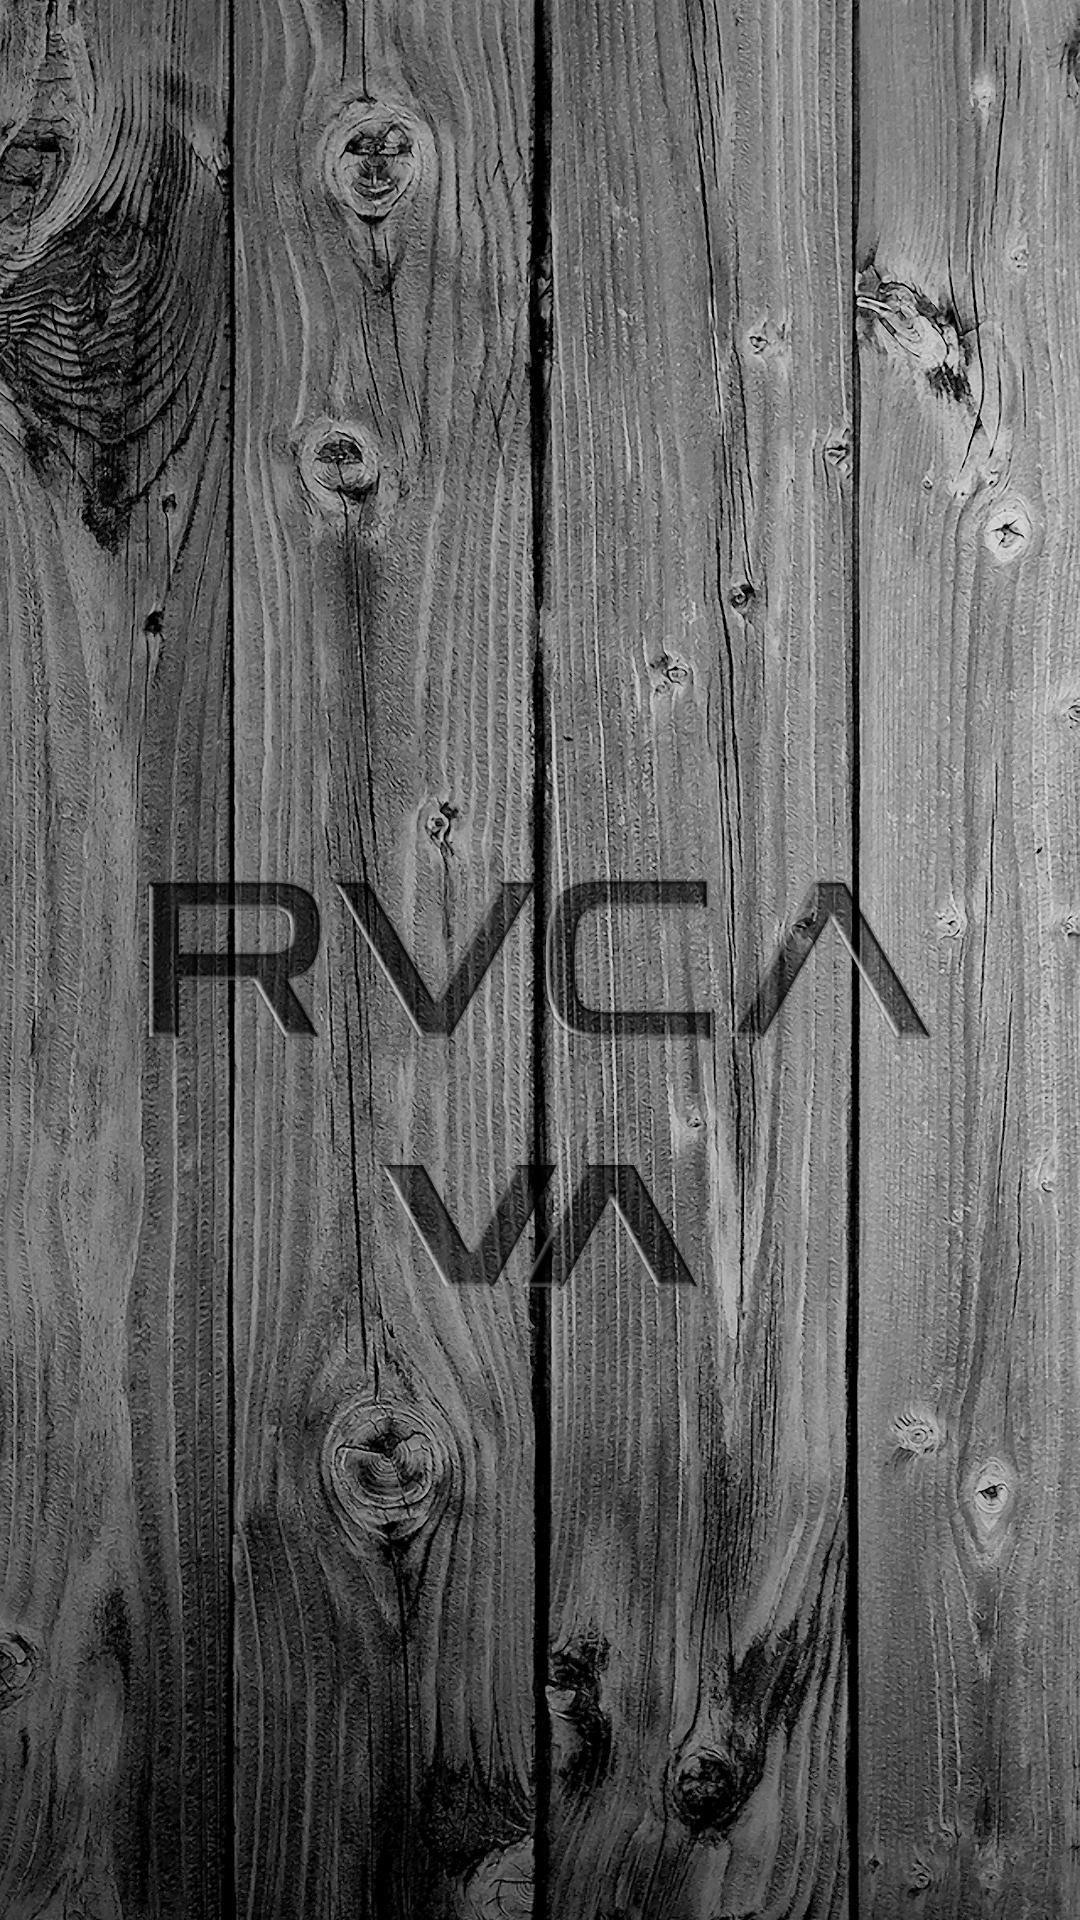 Rvca Wallpapers - Wallpaperpulse Games